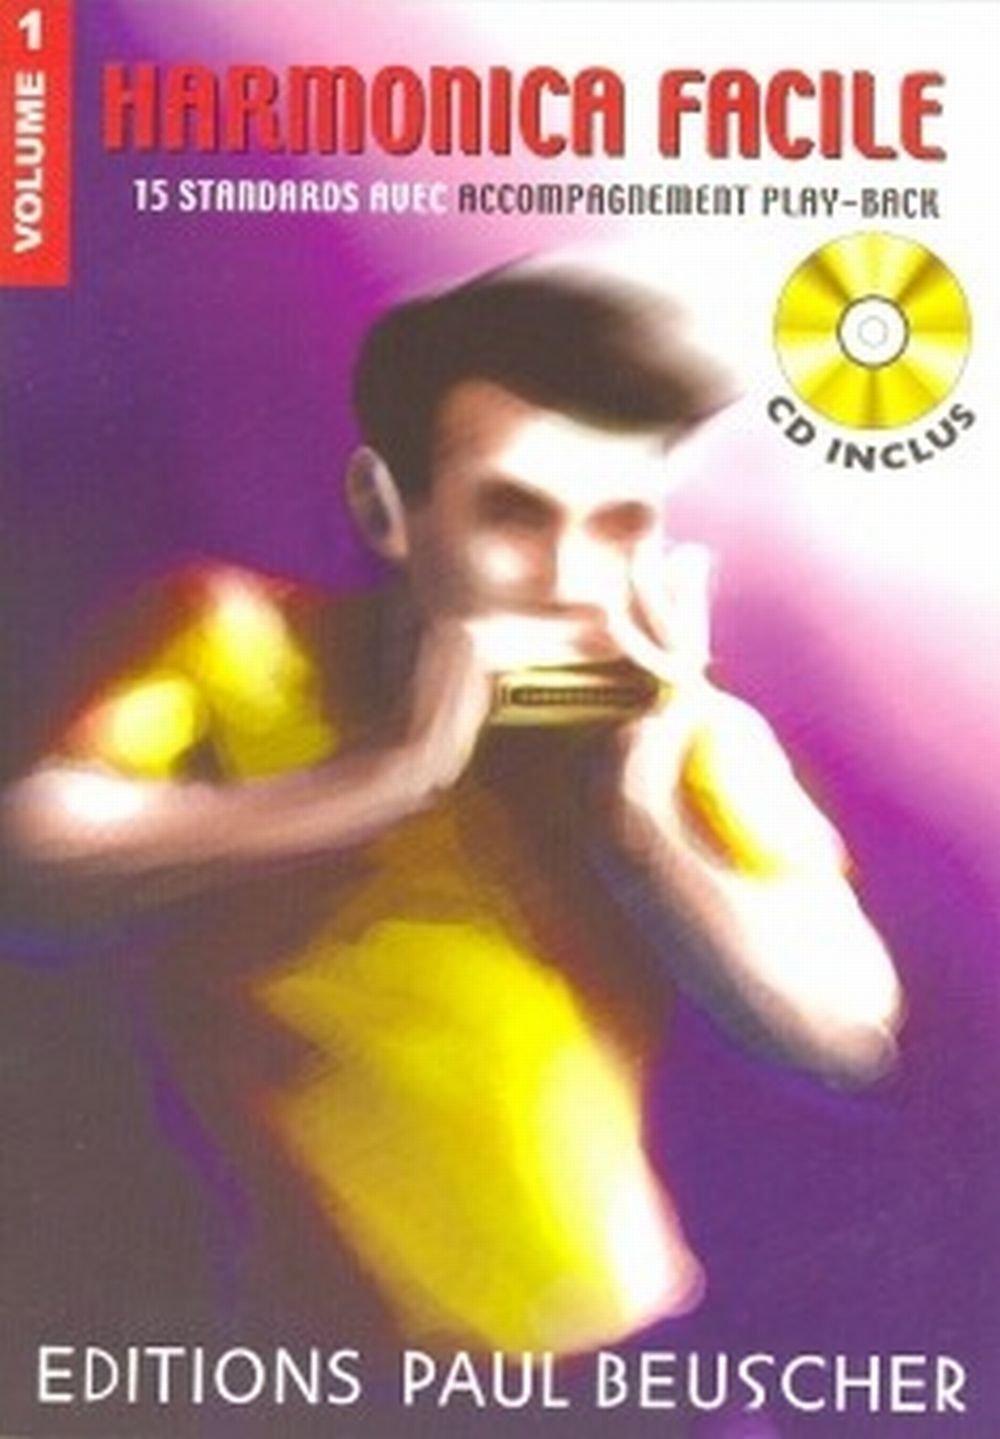 Harmonica Facile Vol.1 + CD - Harmonica Paul Beuscher A 3137990012311 Enseignement primaire